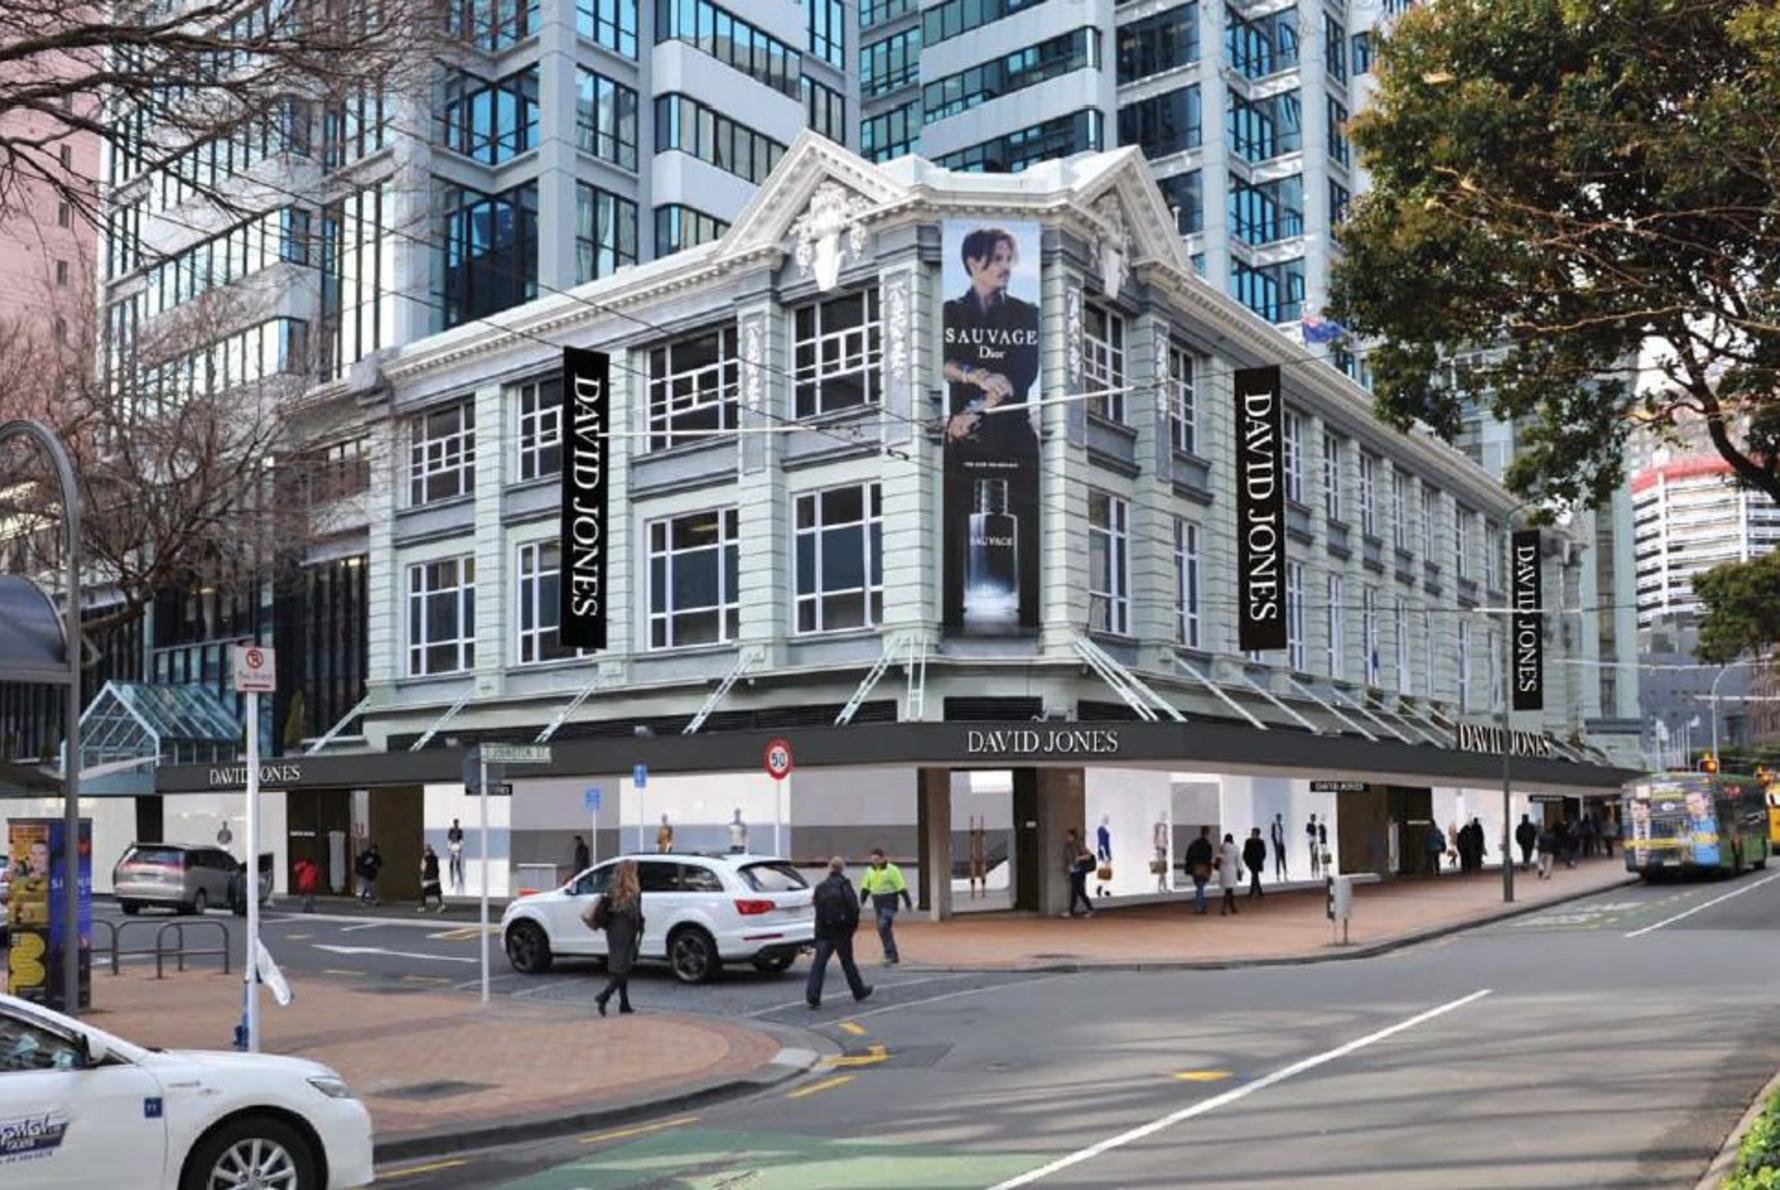 The new David Jones flagship store in Wellington